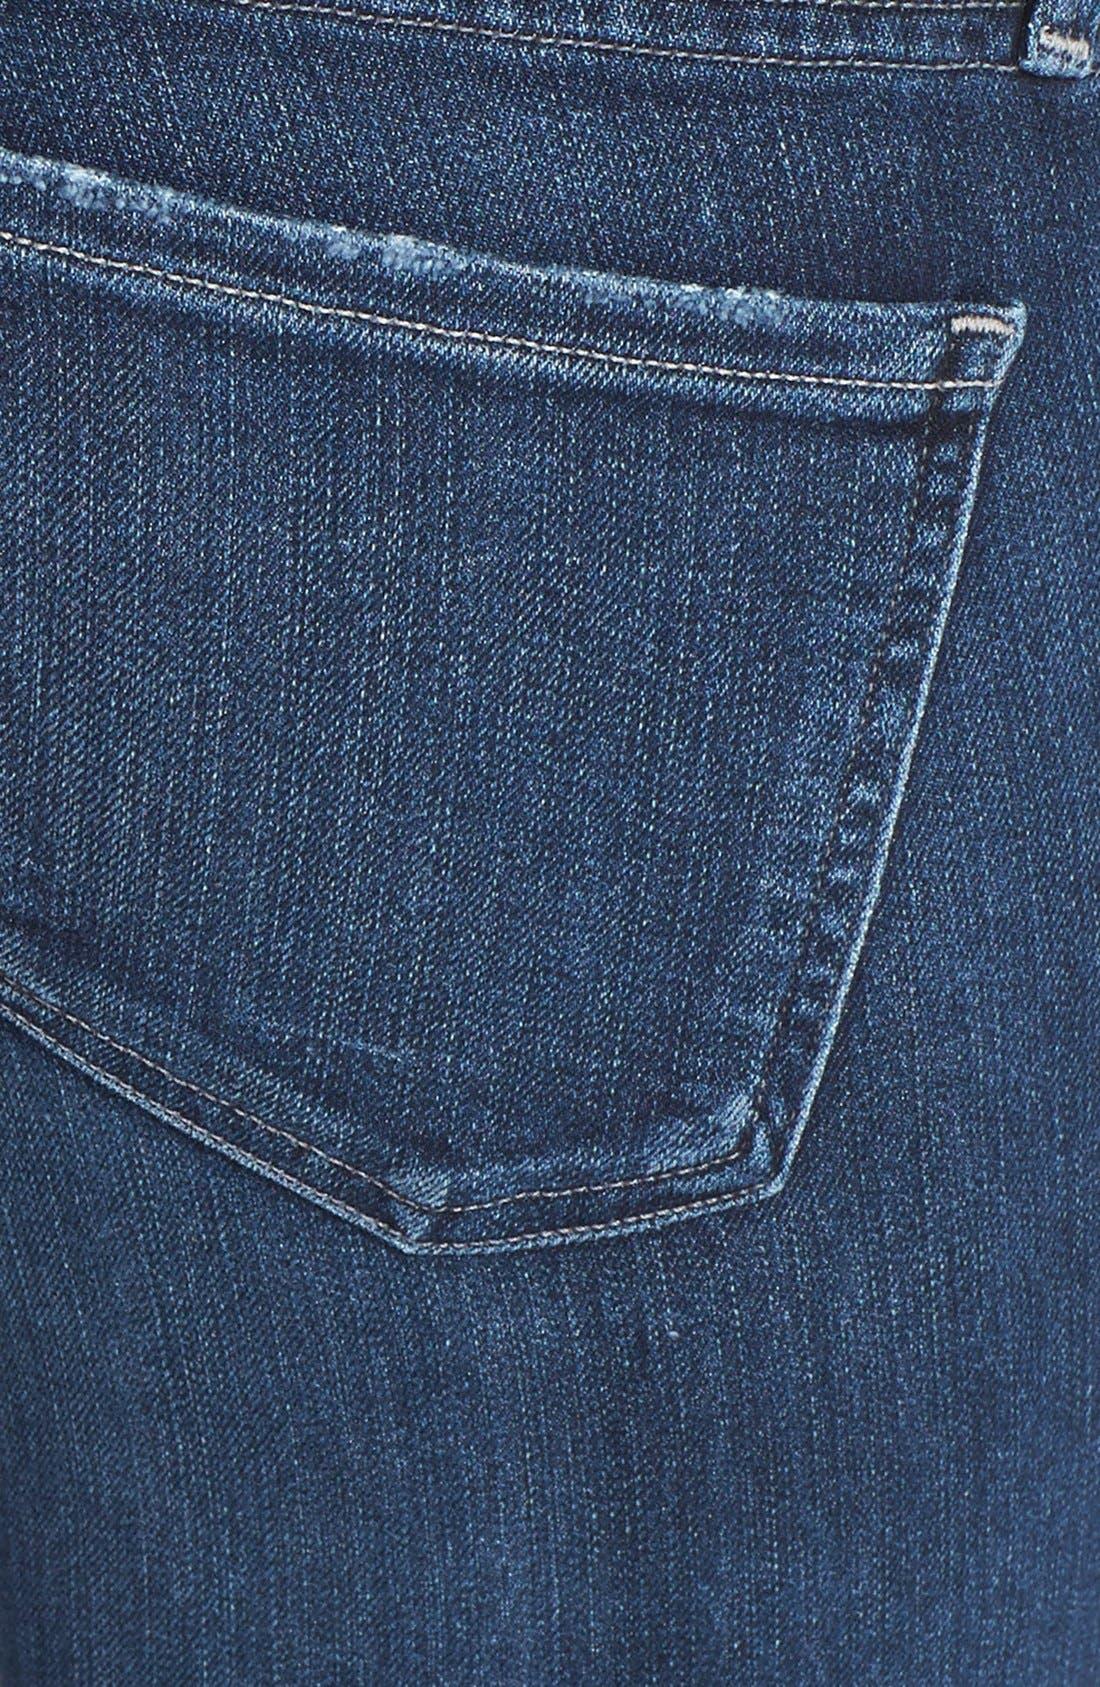 Alternate Image 3  - Citizens of Humanity Arielle Slim Jeans (Hewett)